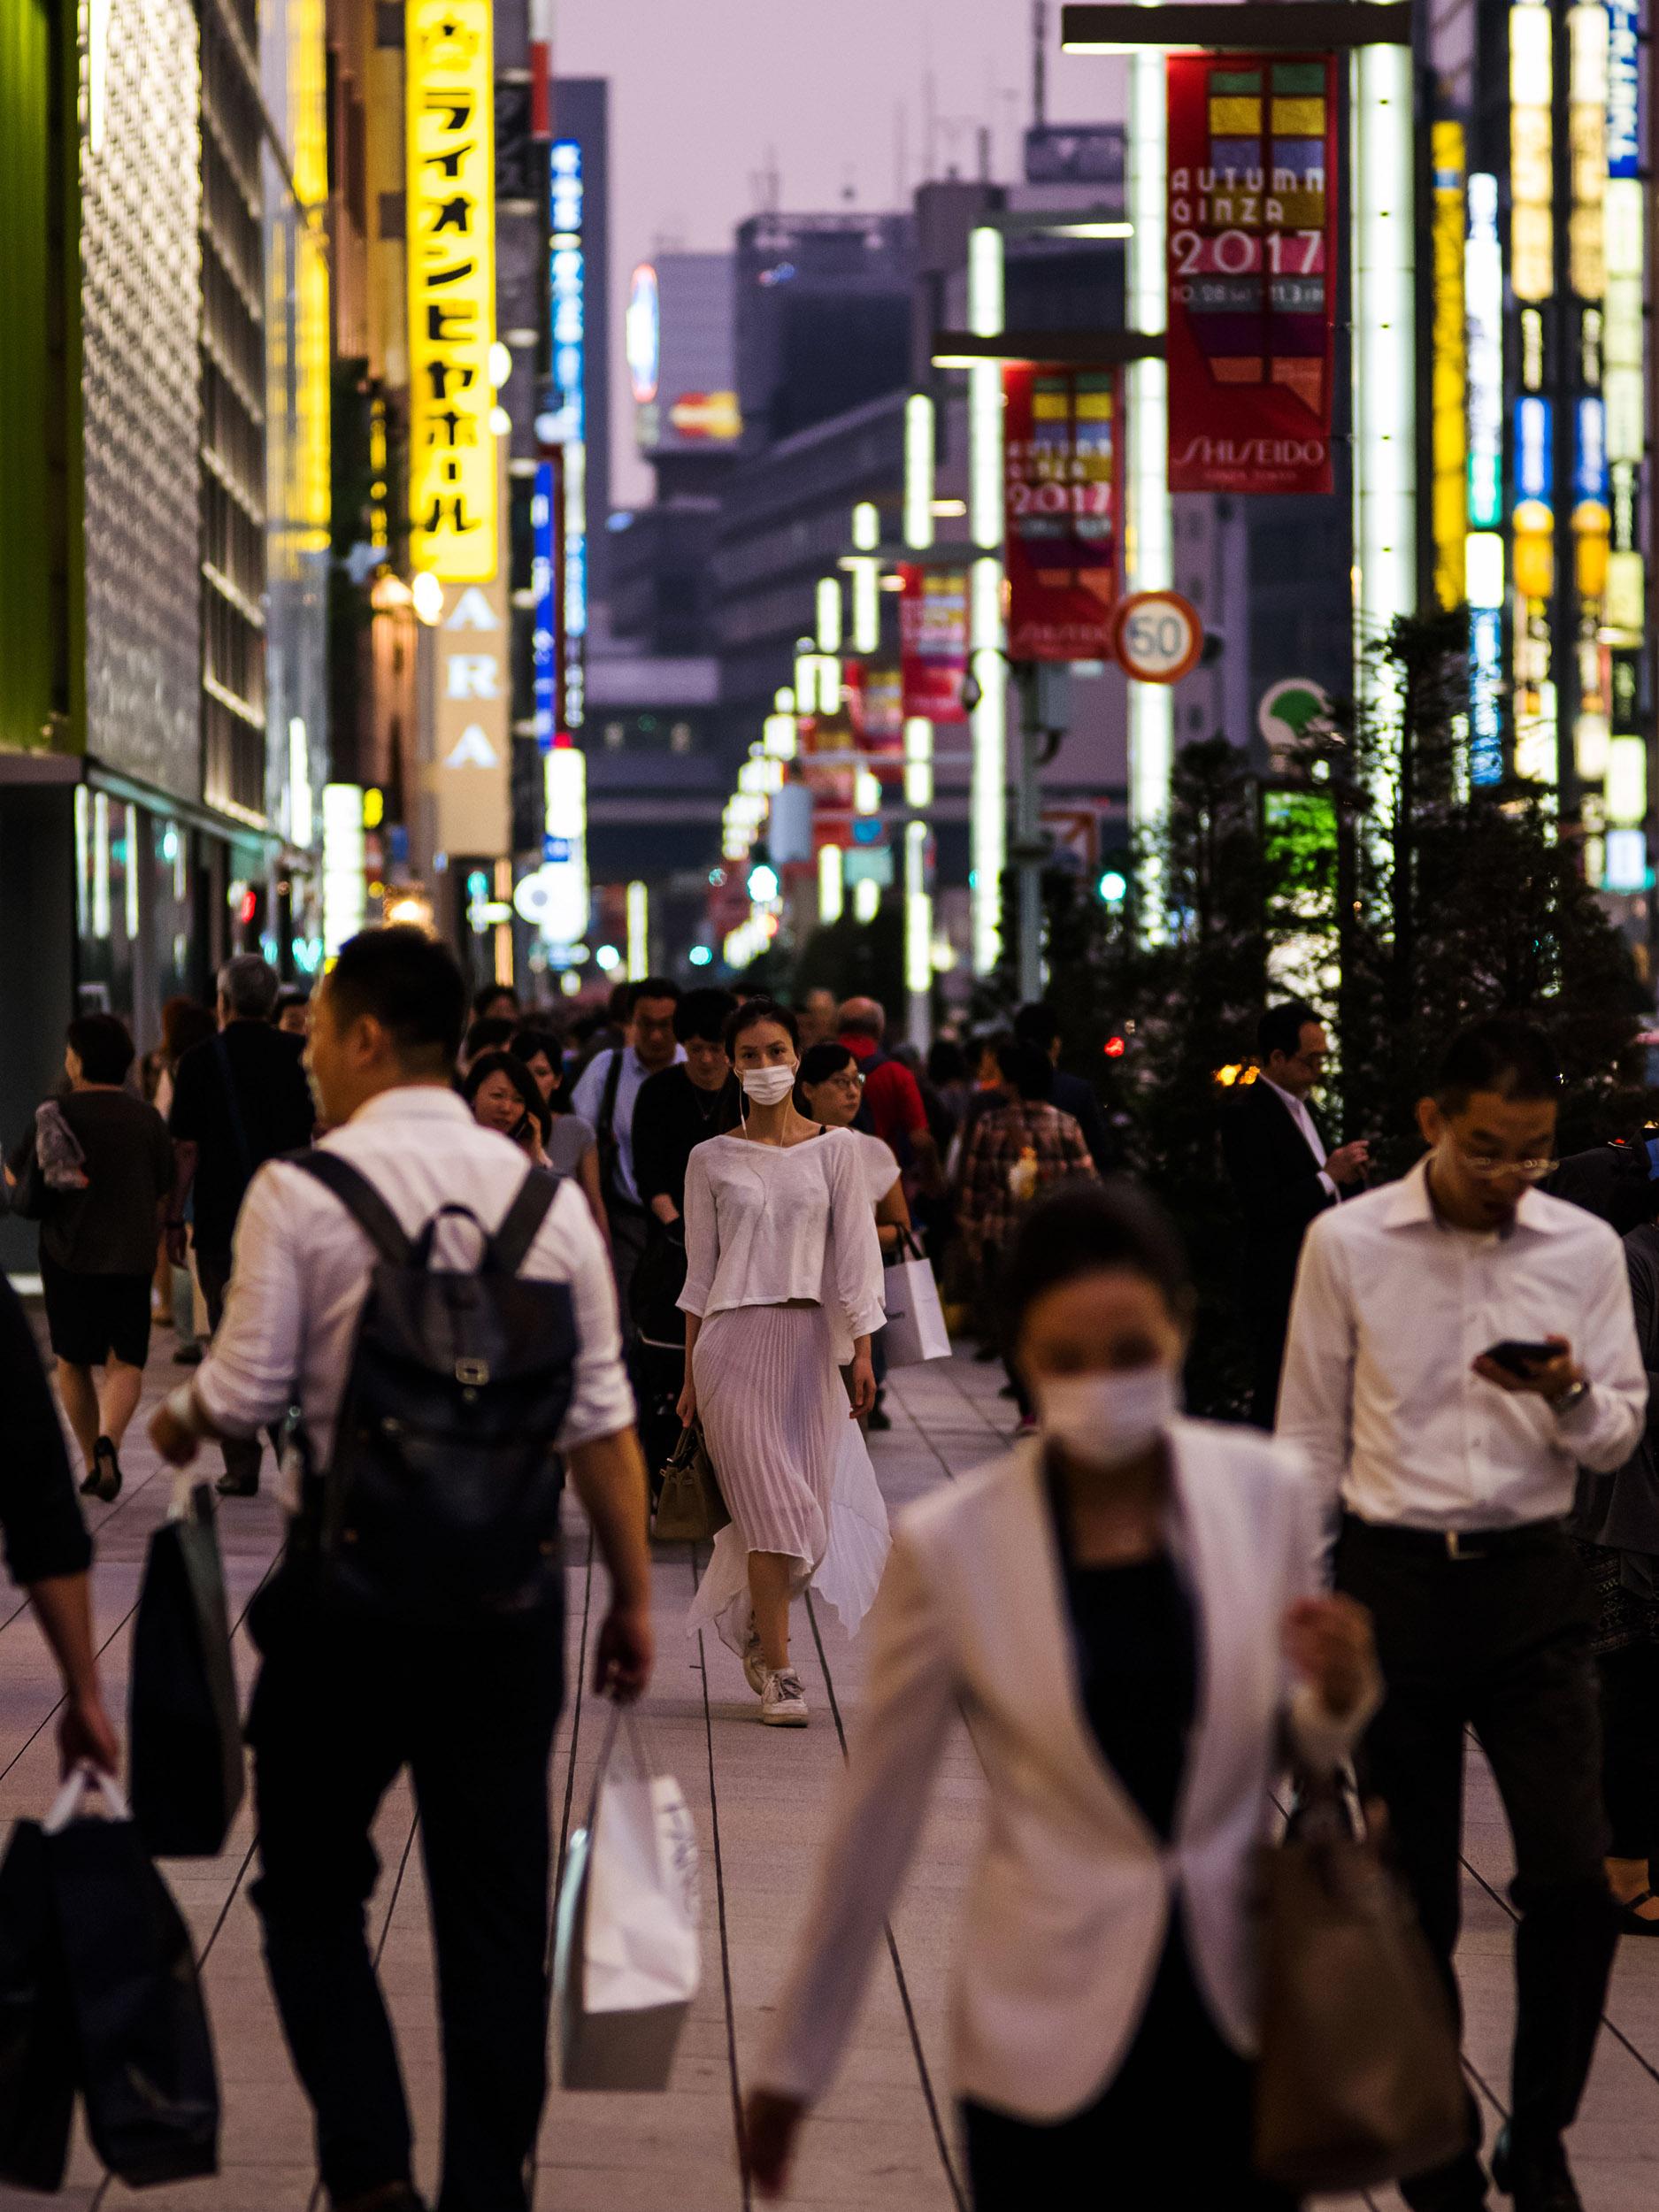 street-photography-tokyo-ginza_IMG1396.jpg